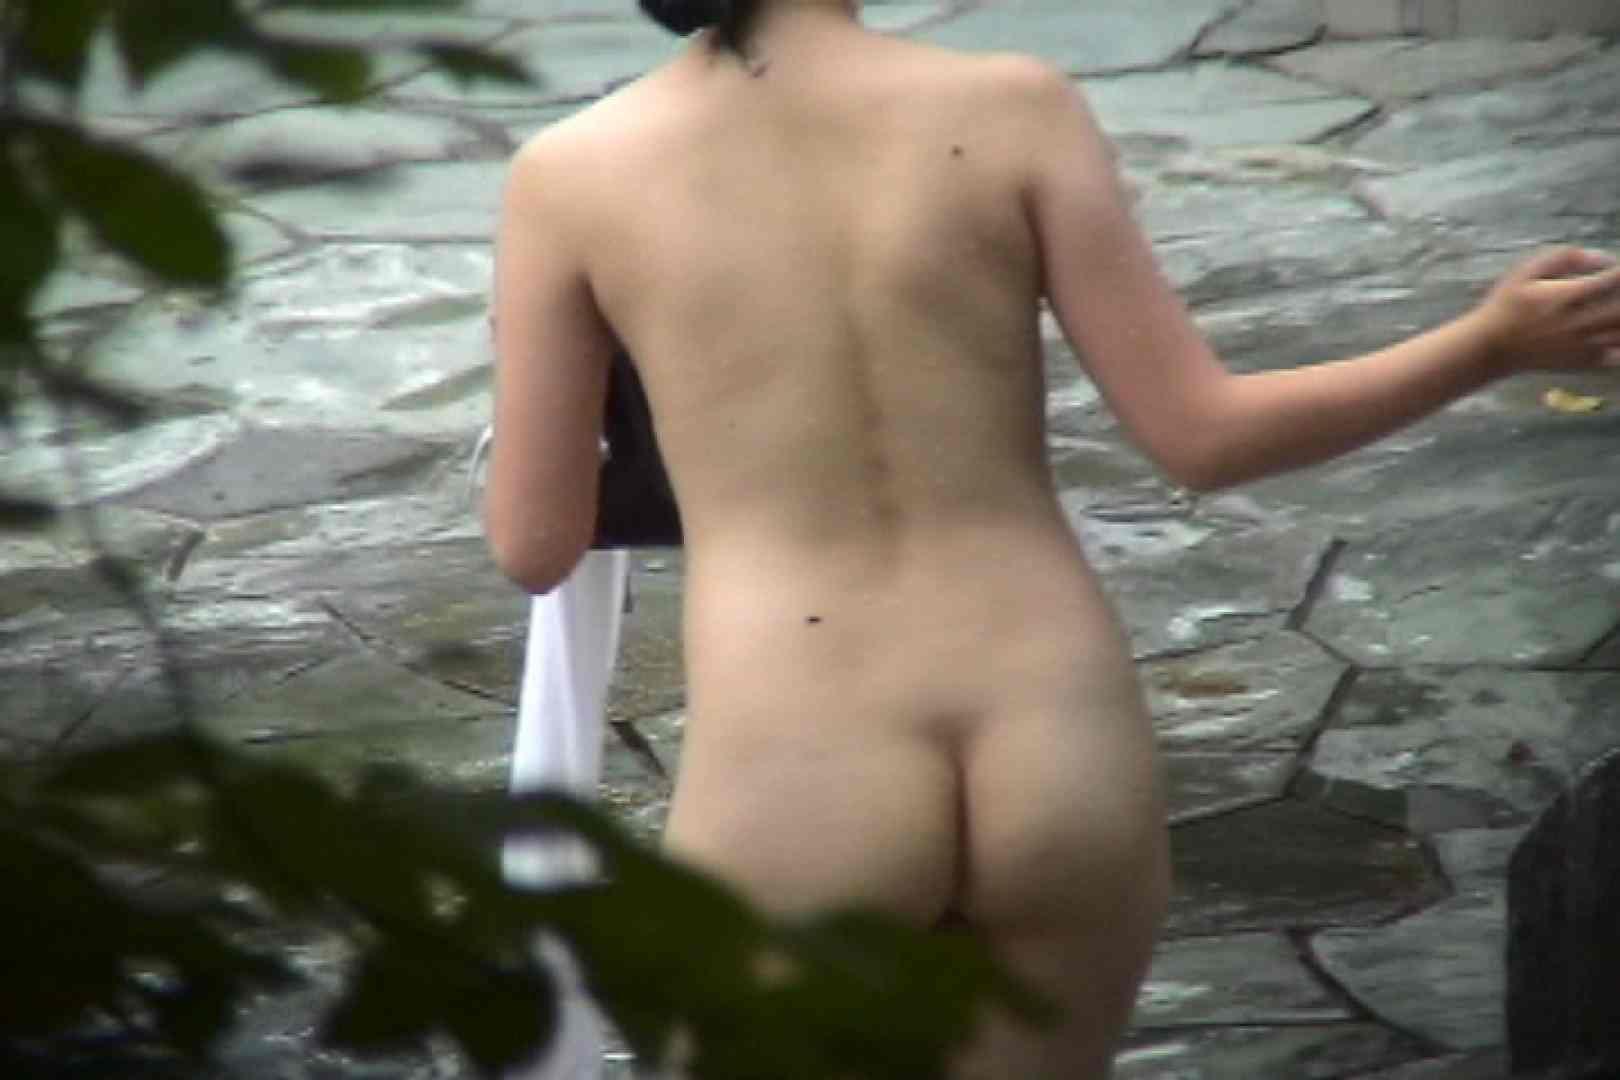 Aquaな露天風呂Vol.456 盗撮師作品 | 露天風呂突入  88pic 40